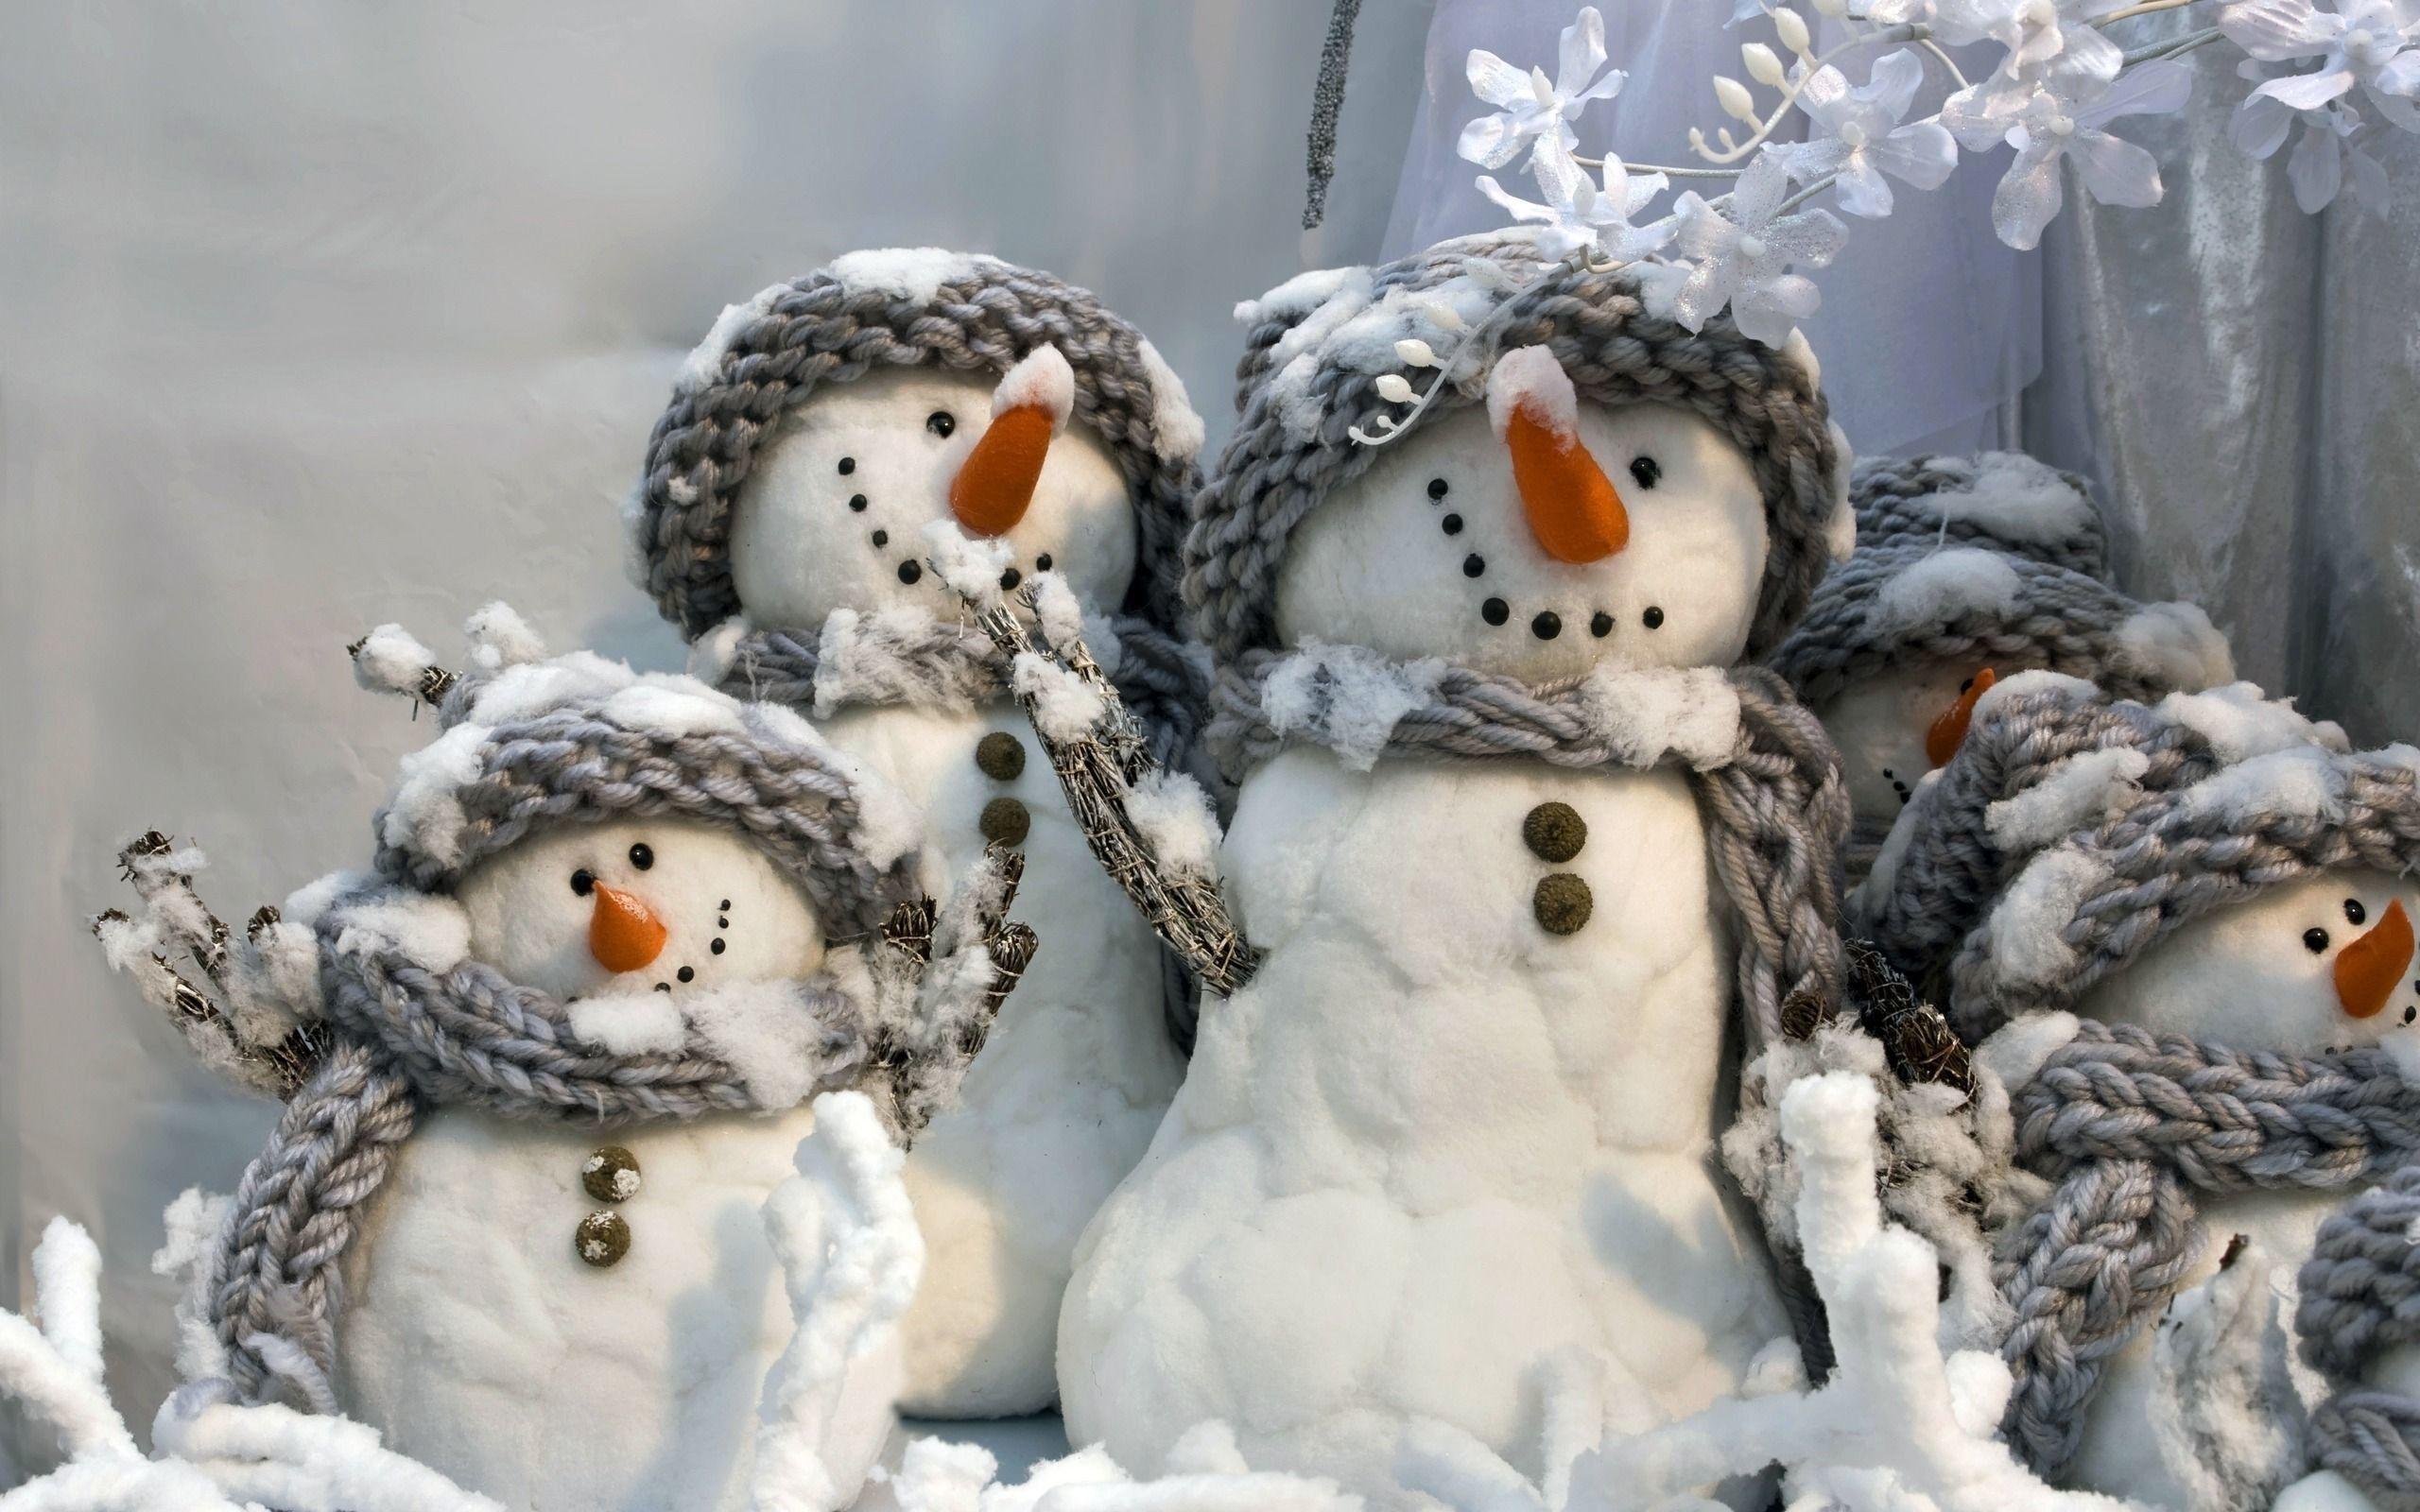 pics of snowman